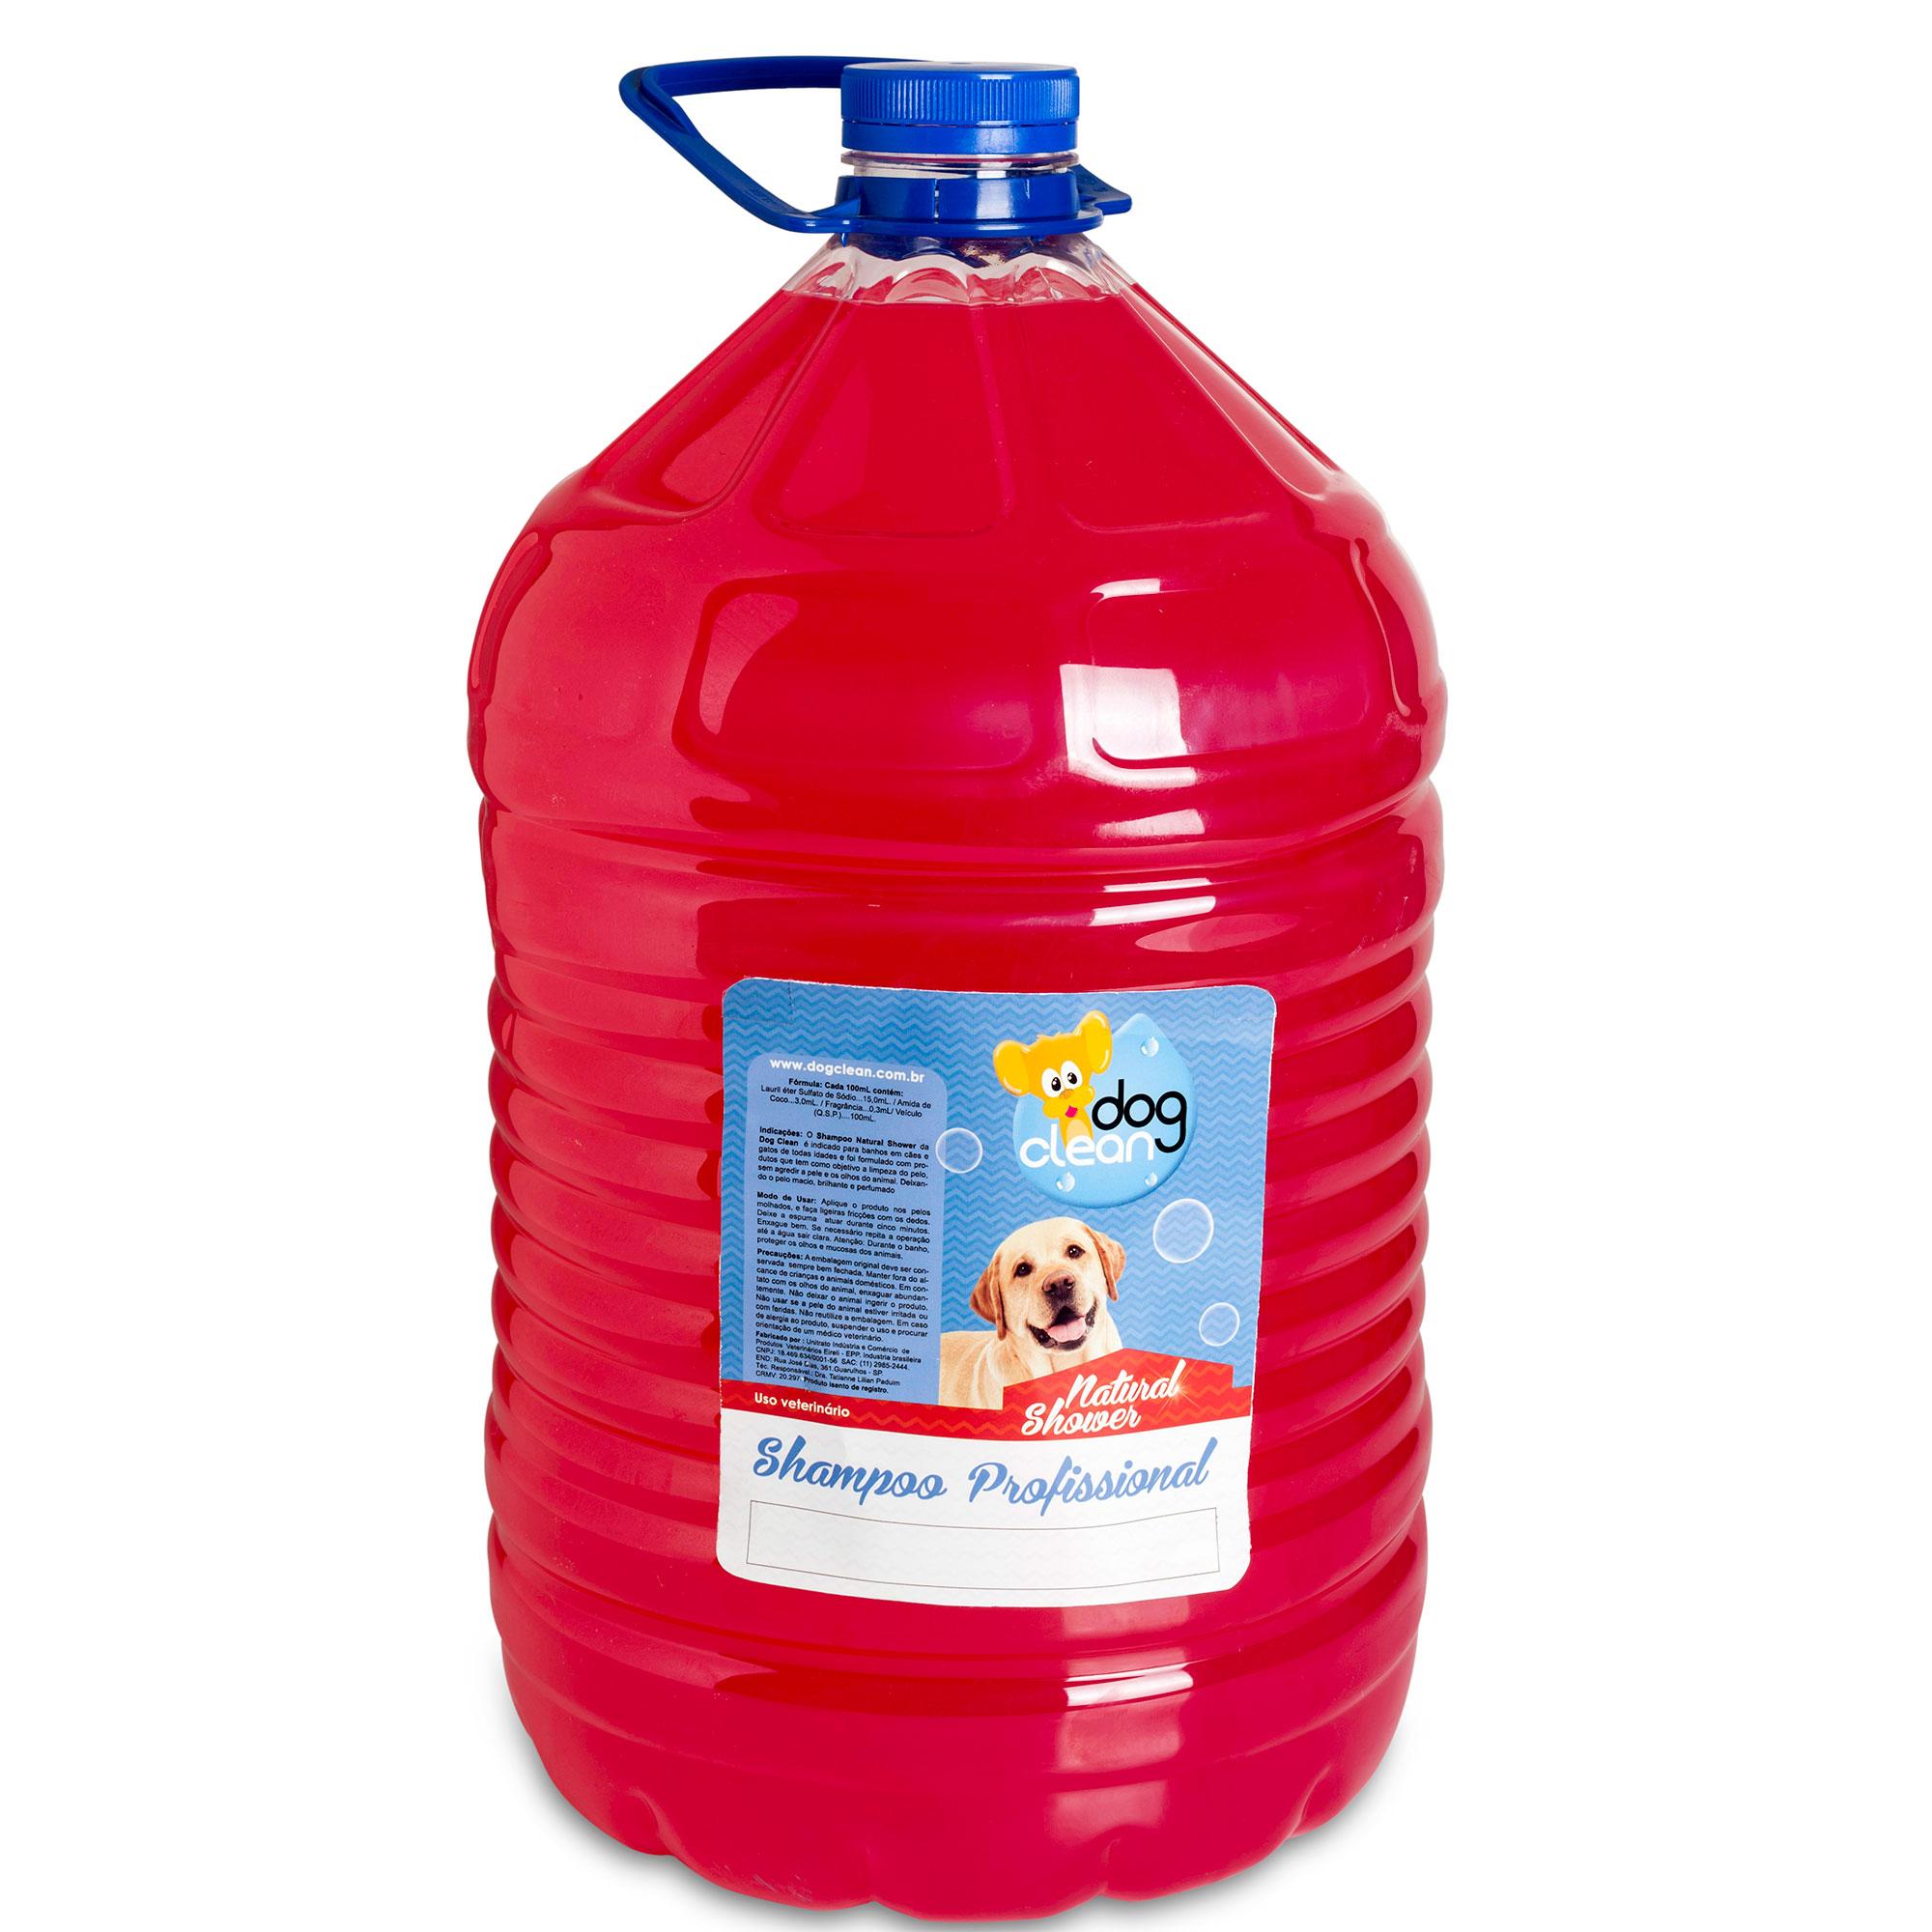 SHAMPOO PROFISSIONAL NATURAL SHOWER 10L DOG CLEAN